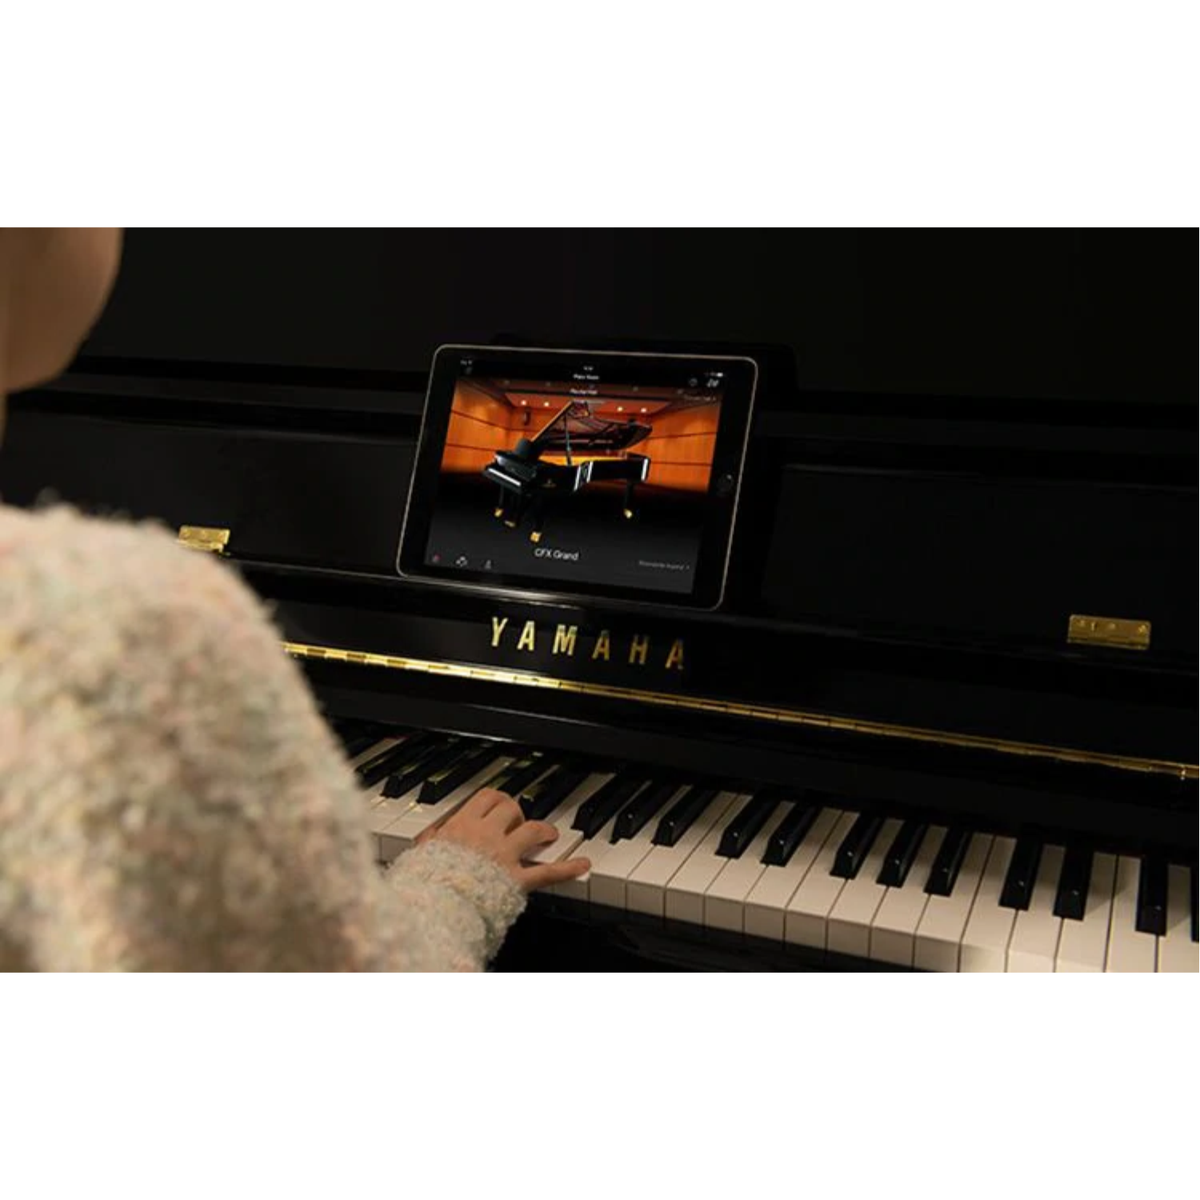 Yamaha - GC1SHTA2 - TransAcoustic Grand Piano Smart Pianist